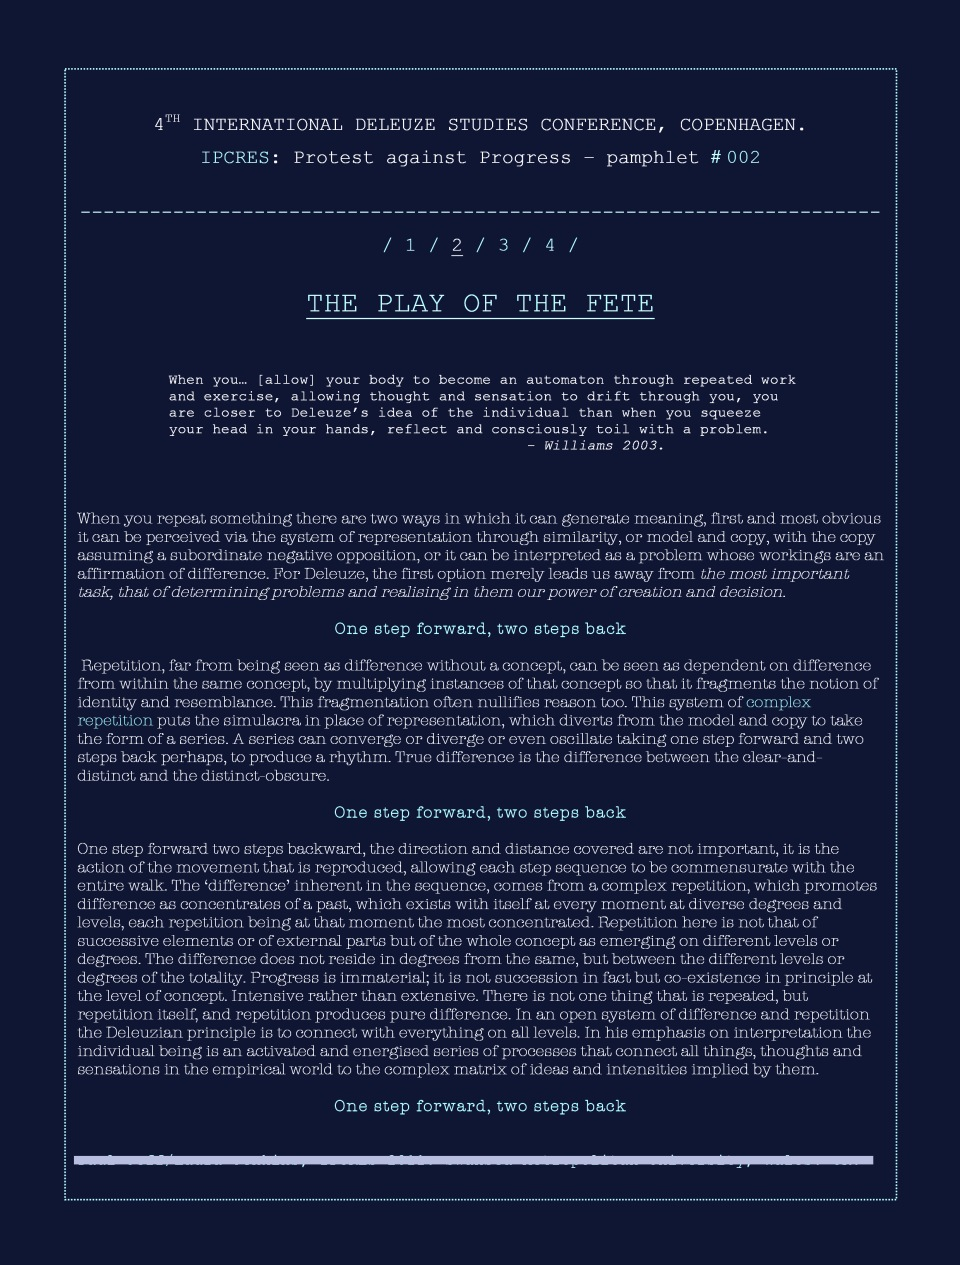 cph pamphlet blue 2.jpg